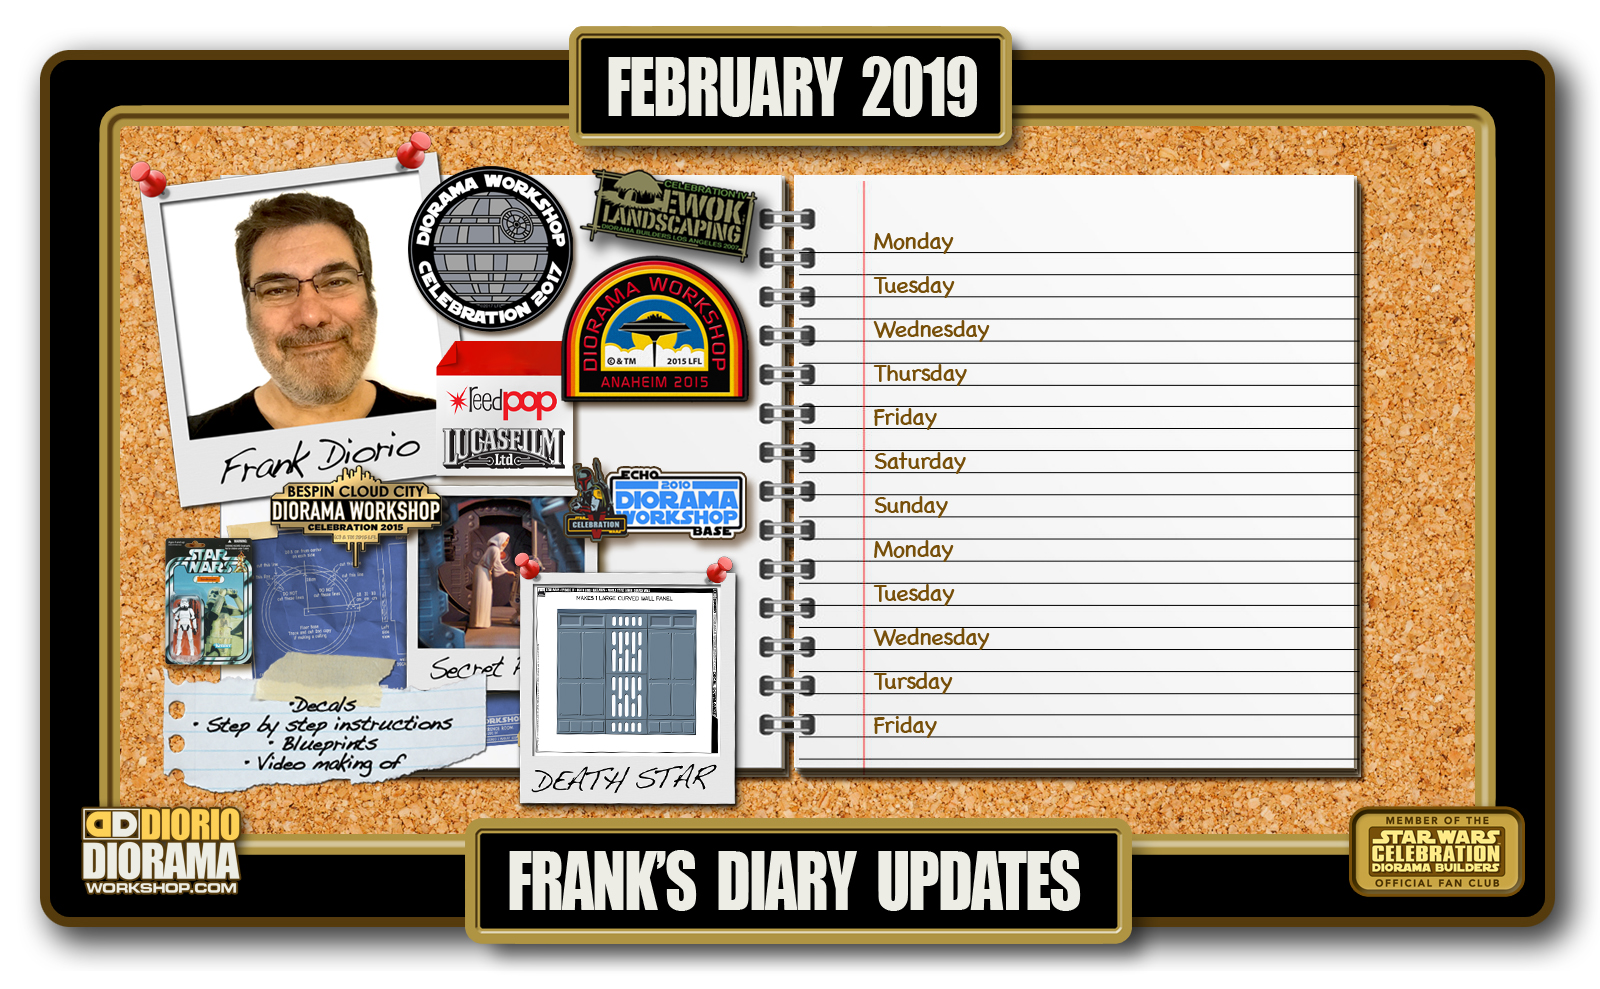 HOME • FRANK'S DAILY DIARY • FEBRUARY 2019